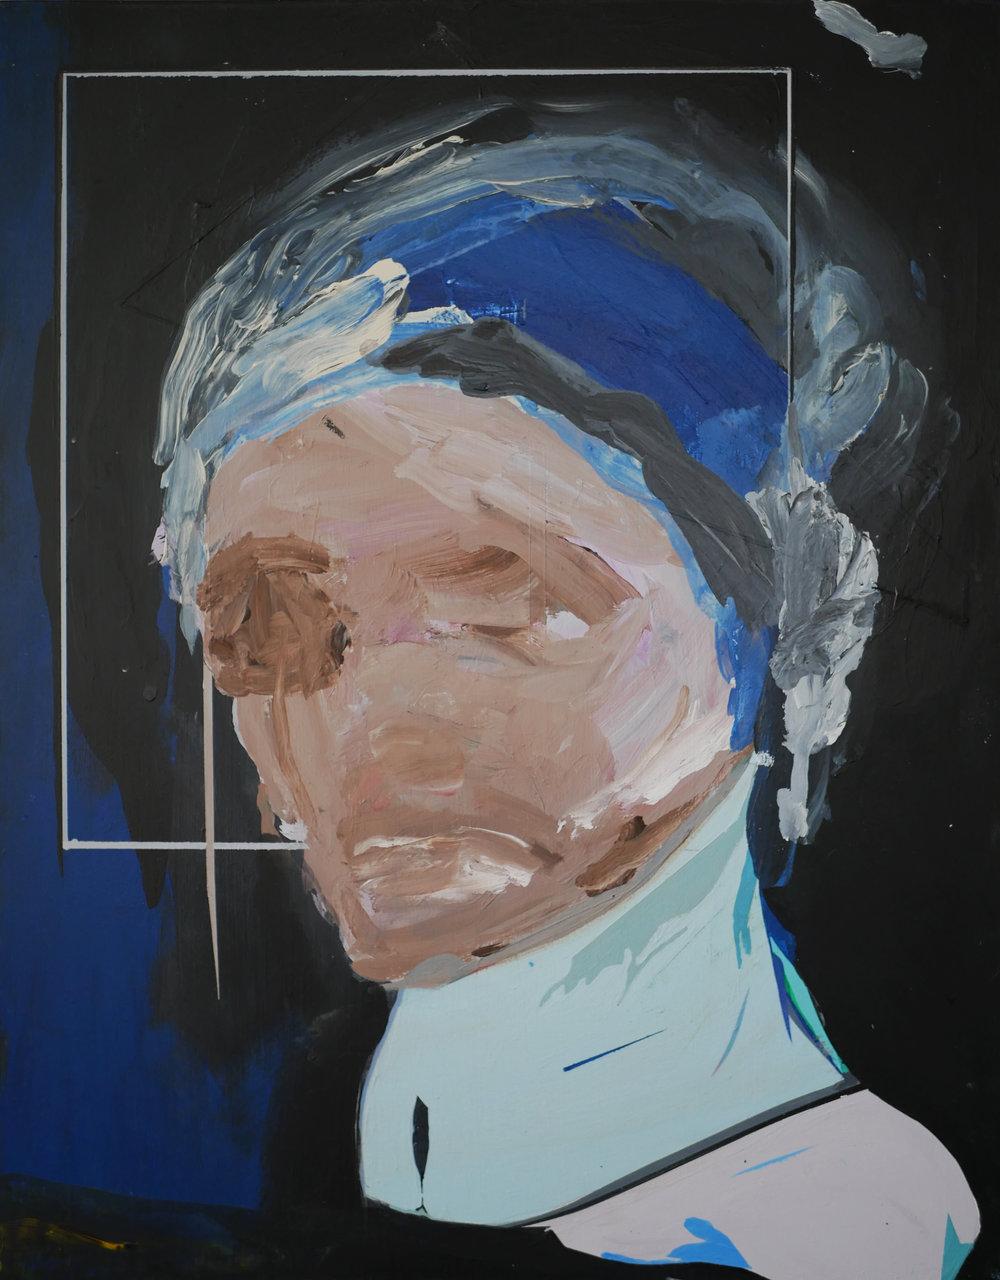 PHANTOM STUDY    2017 Acrylic on wood panel 14 x 11 in 35.5 x 27.9 cm